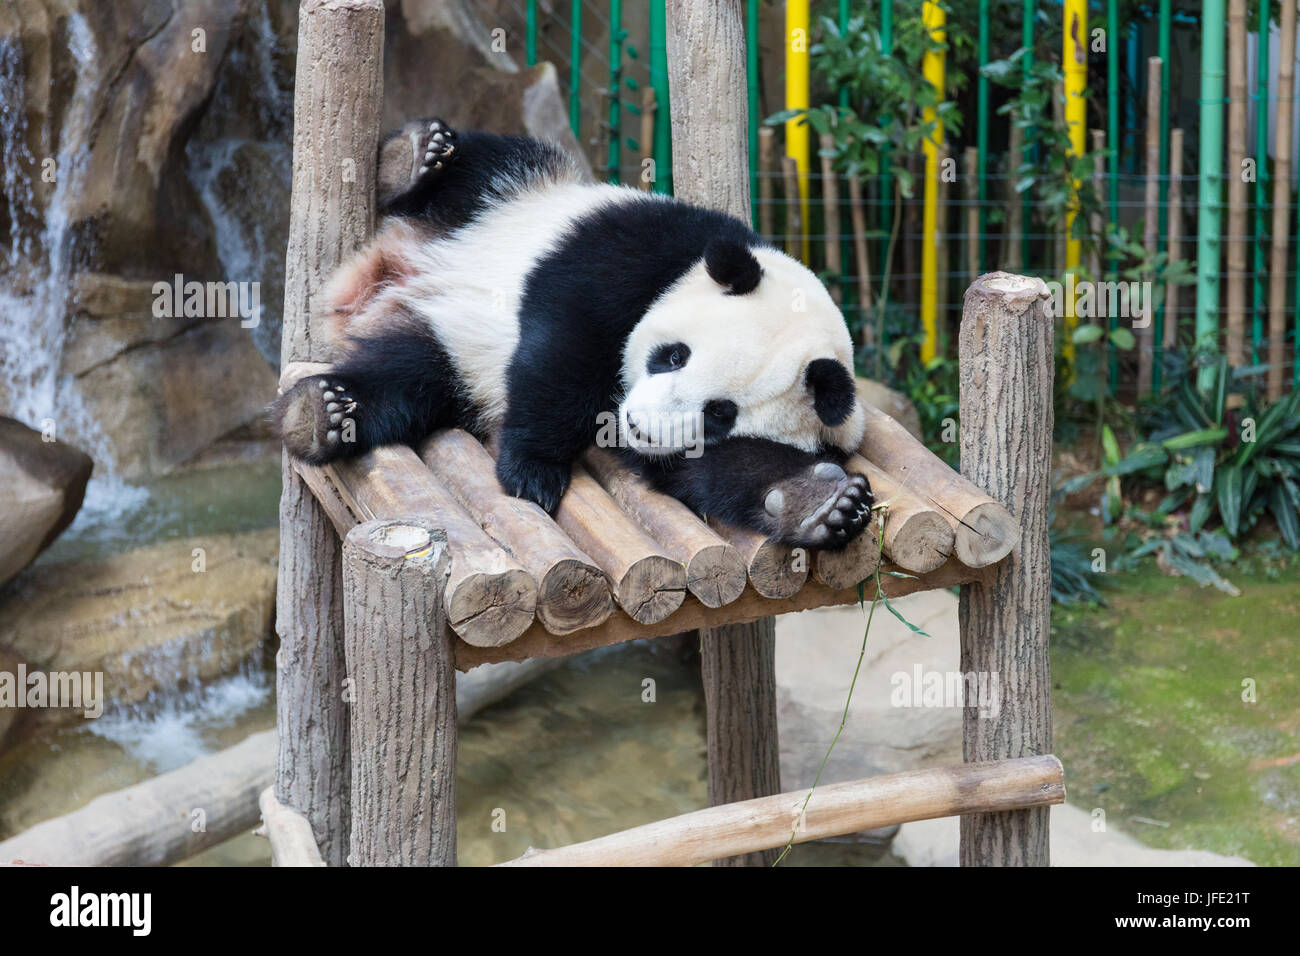 Giant Panda sleeping on wooden platform at the zoo - Stock Image